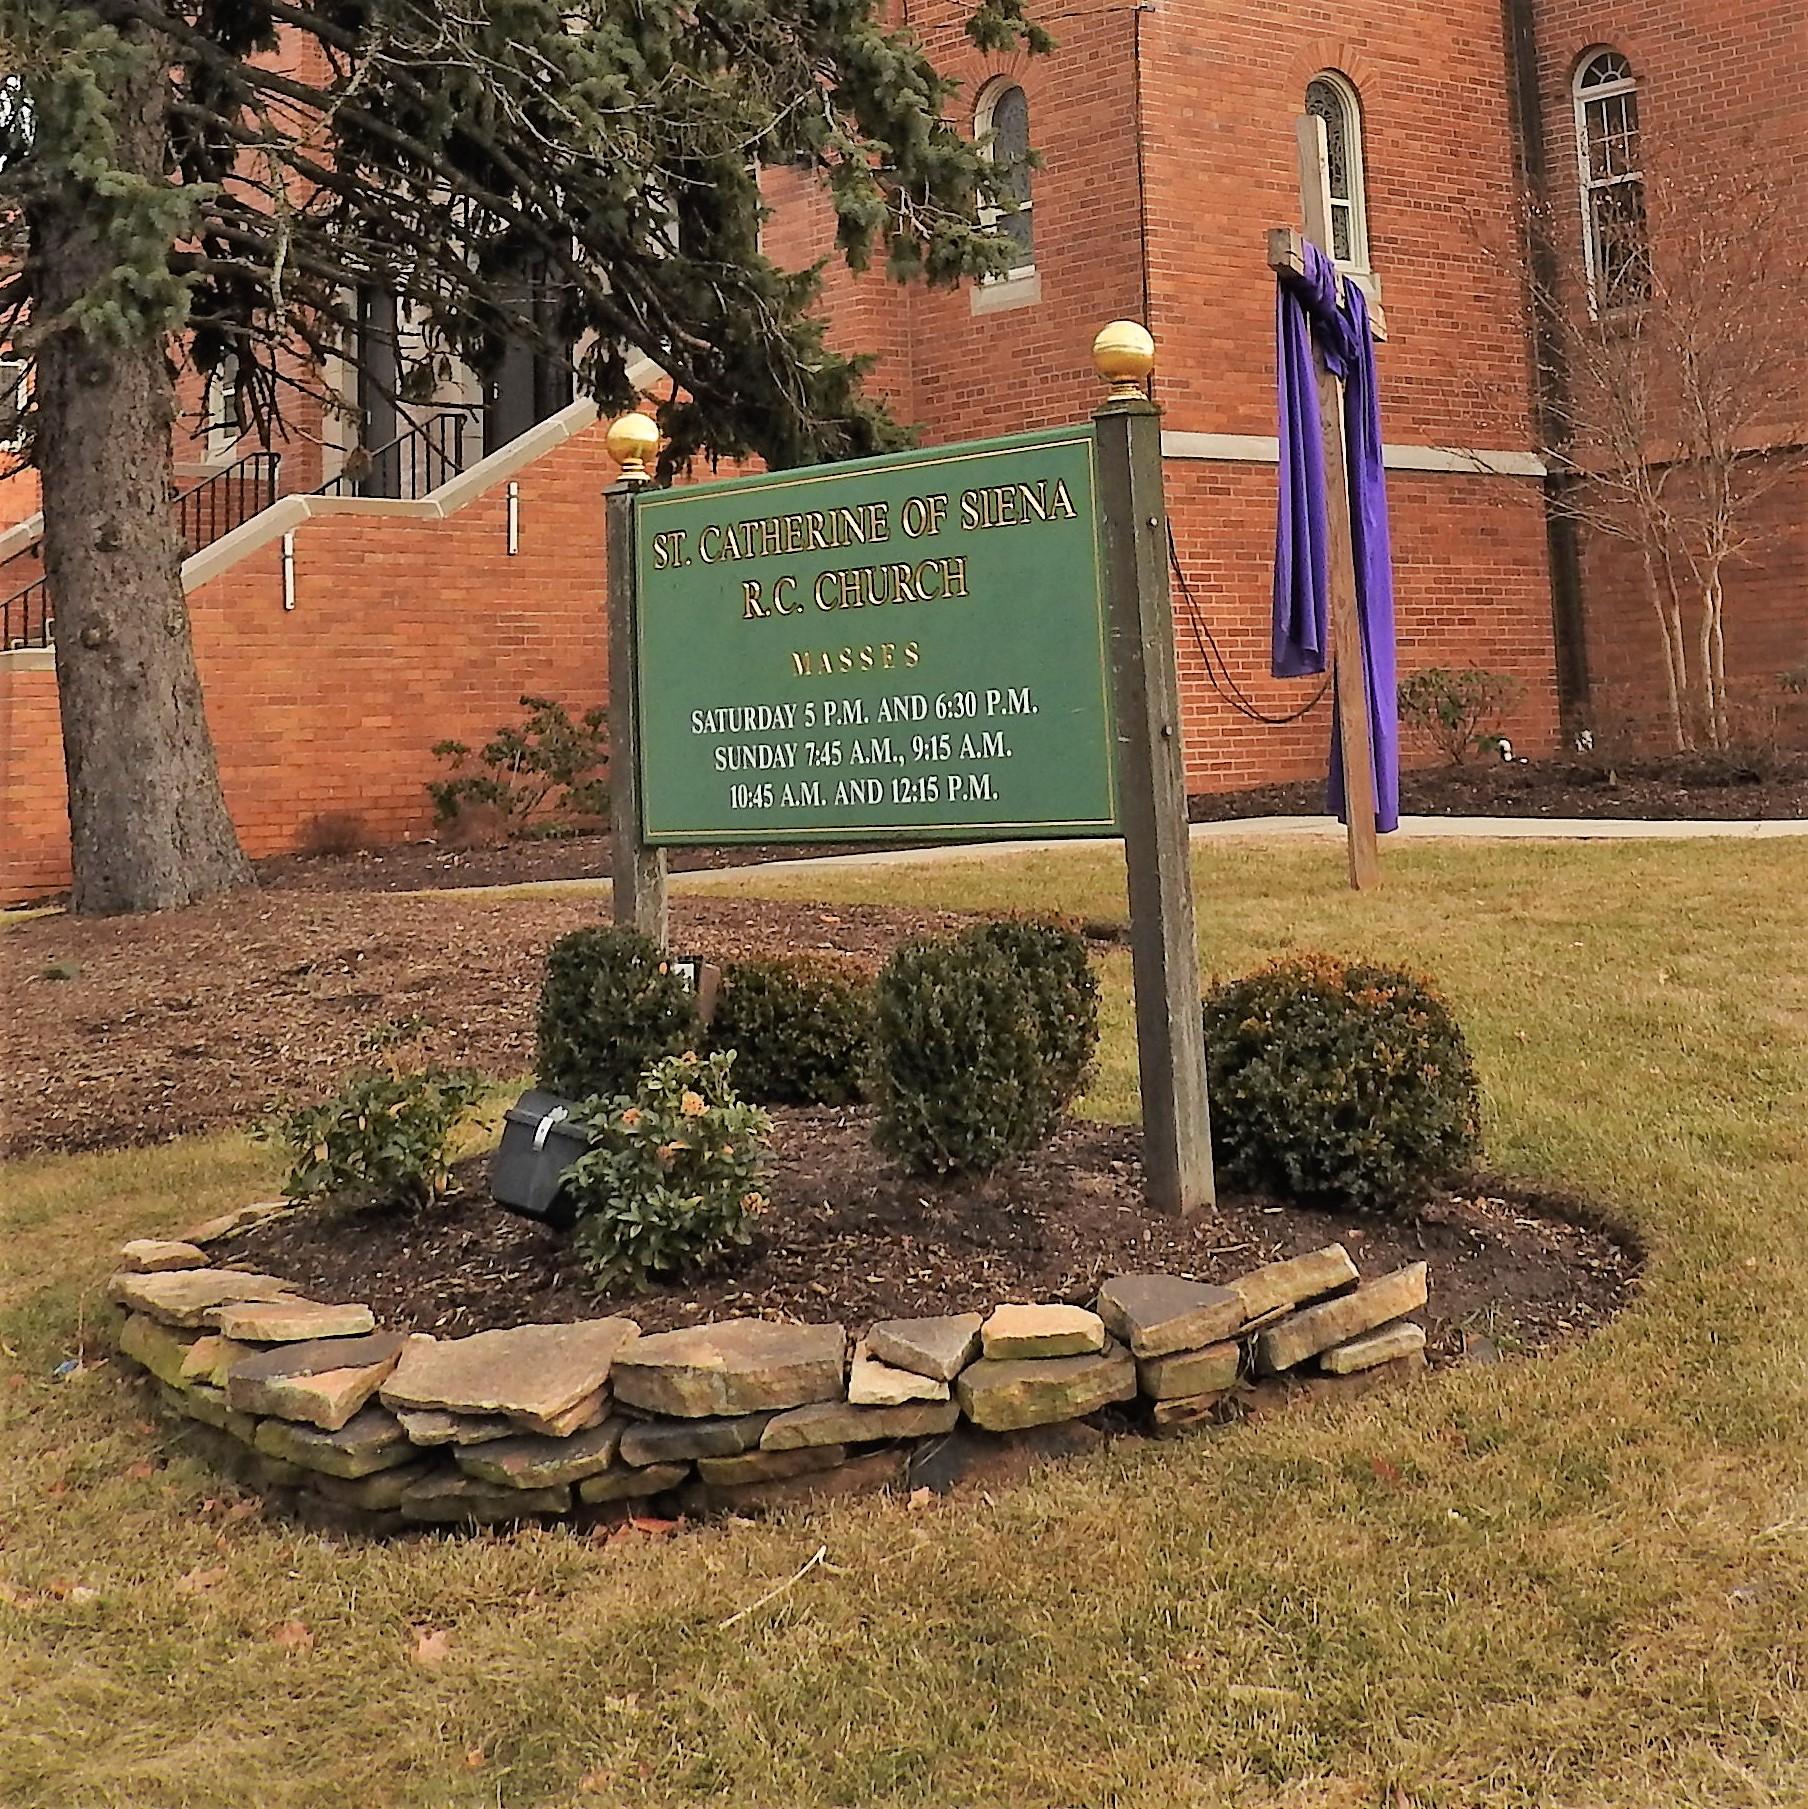 File:Catherine RCC Cedar Grove sign jeh.jpg - Wikimedia Commons